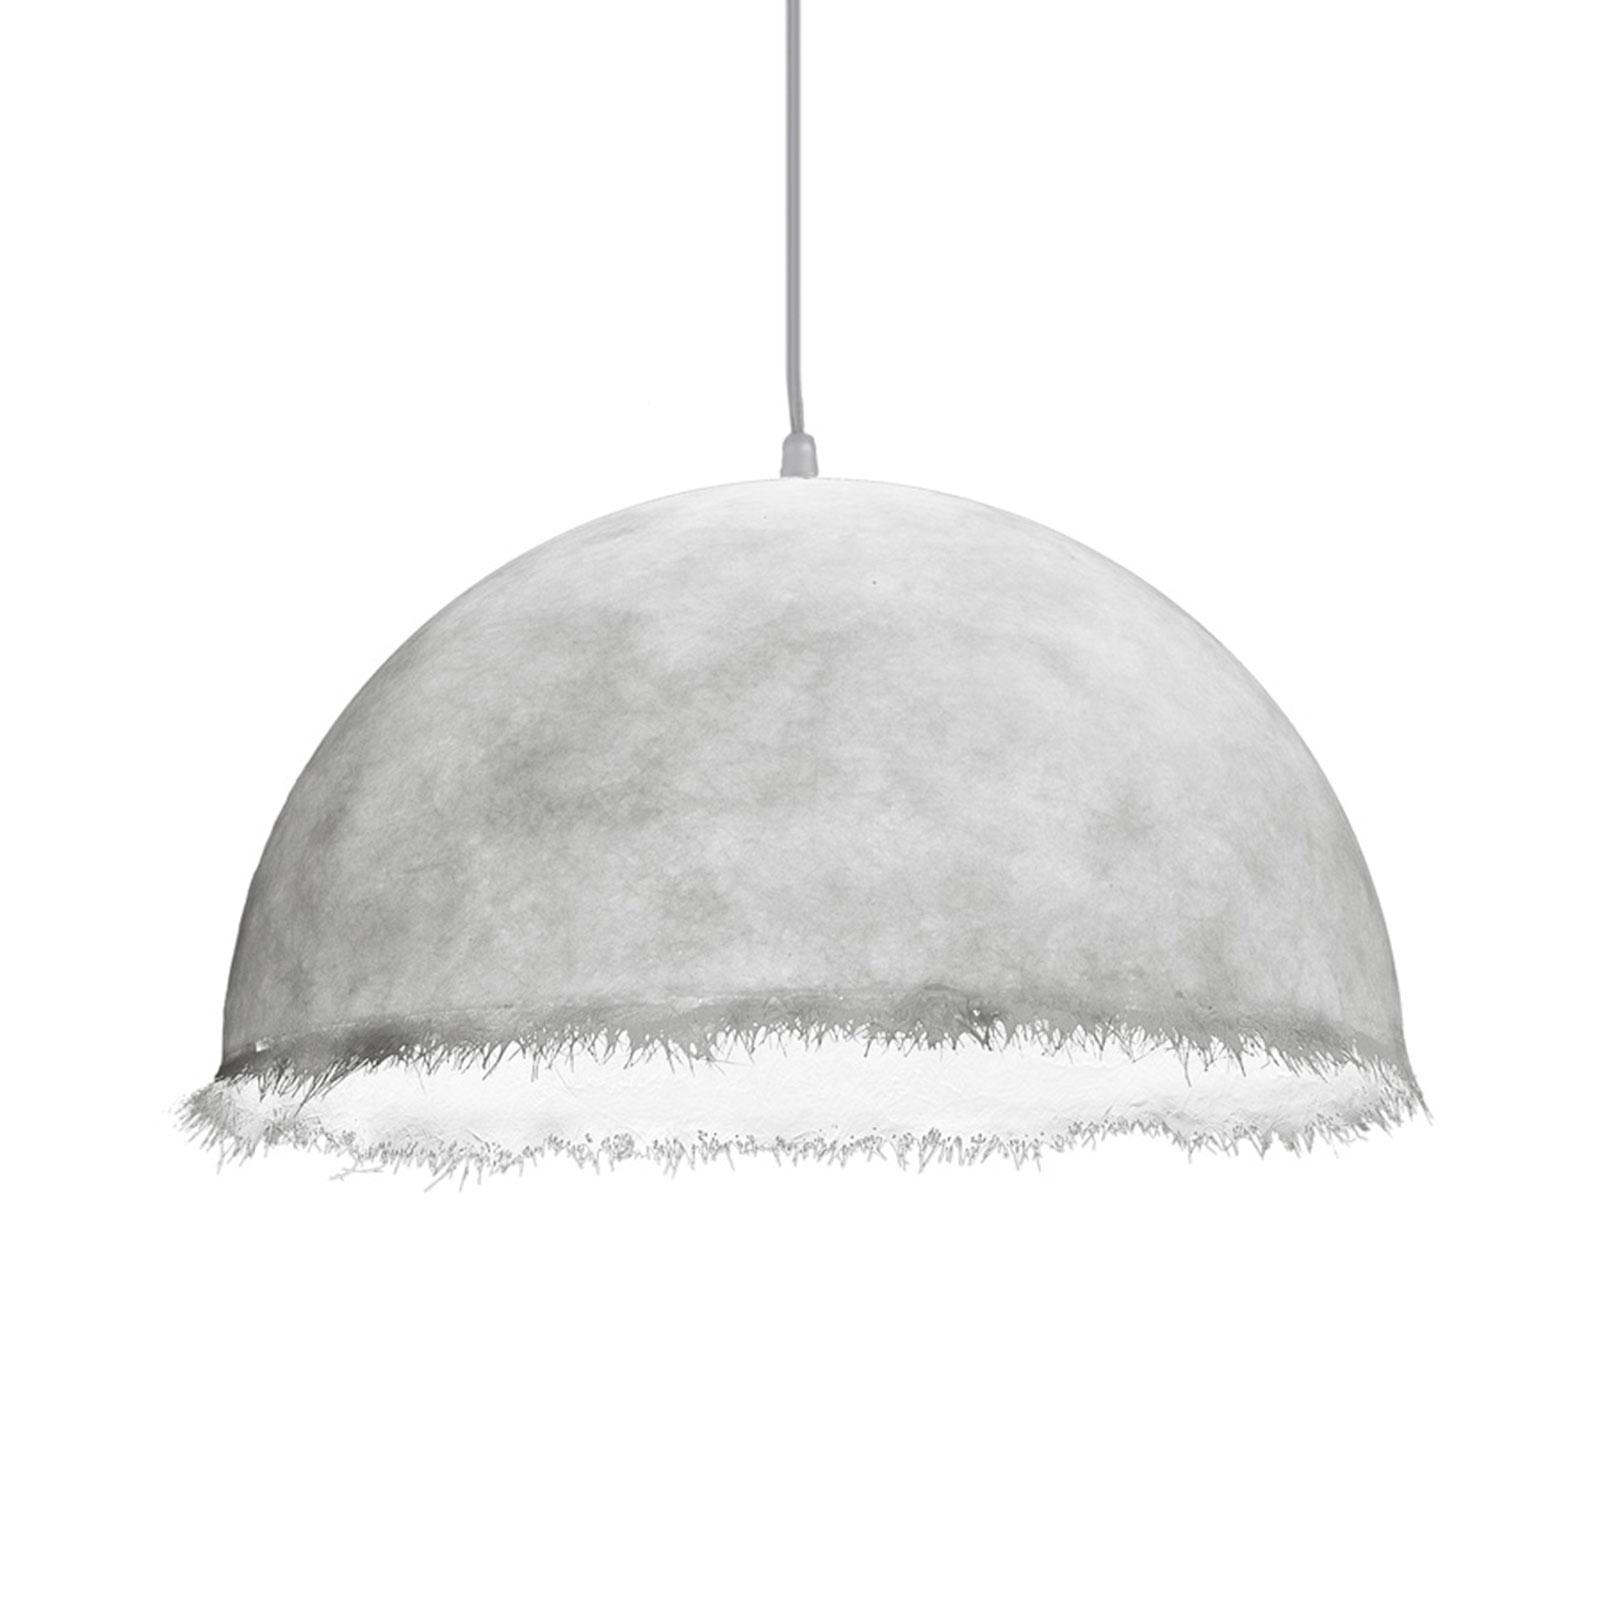 Karman Plancton LED-utomhushänglampa Ø 45 cm